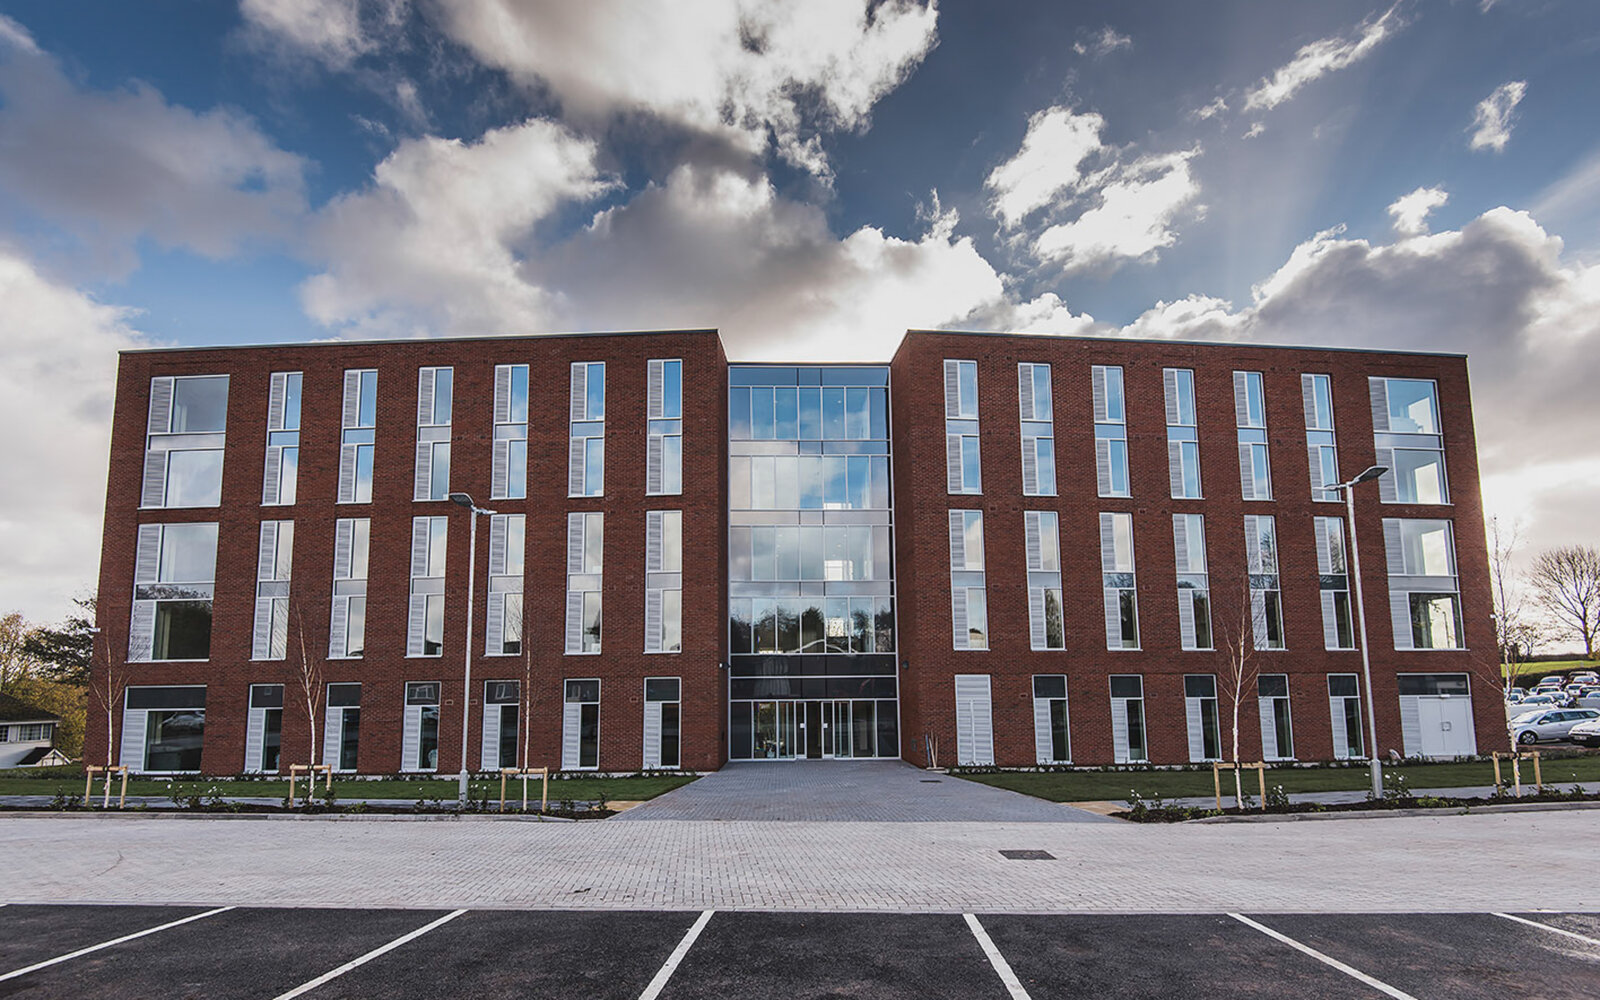 Newman University Halls of Residence